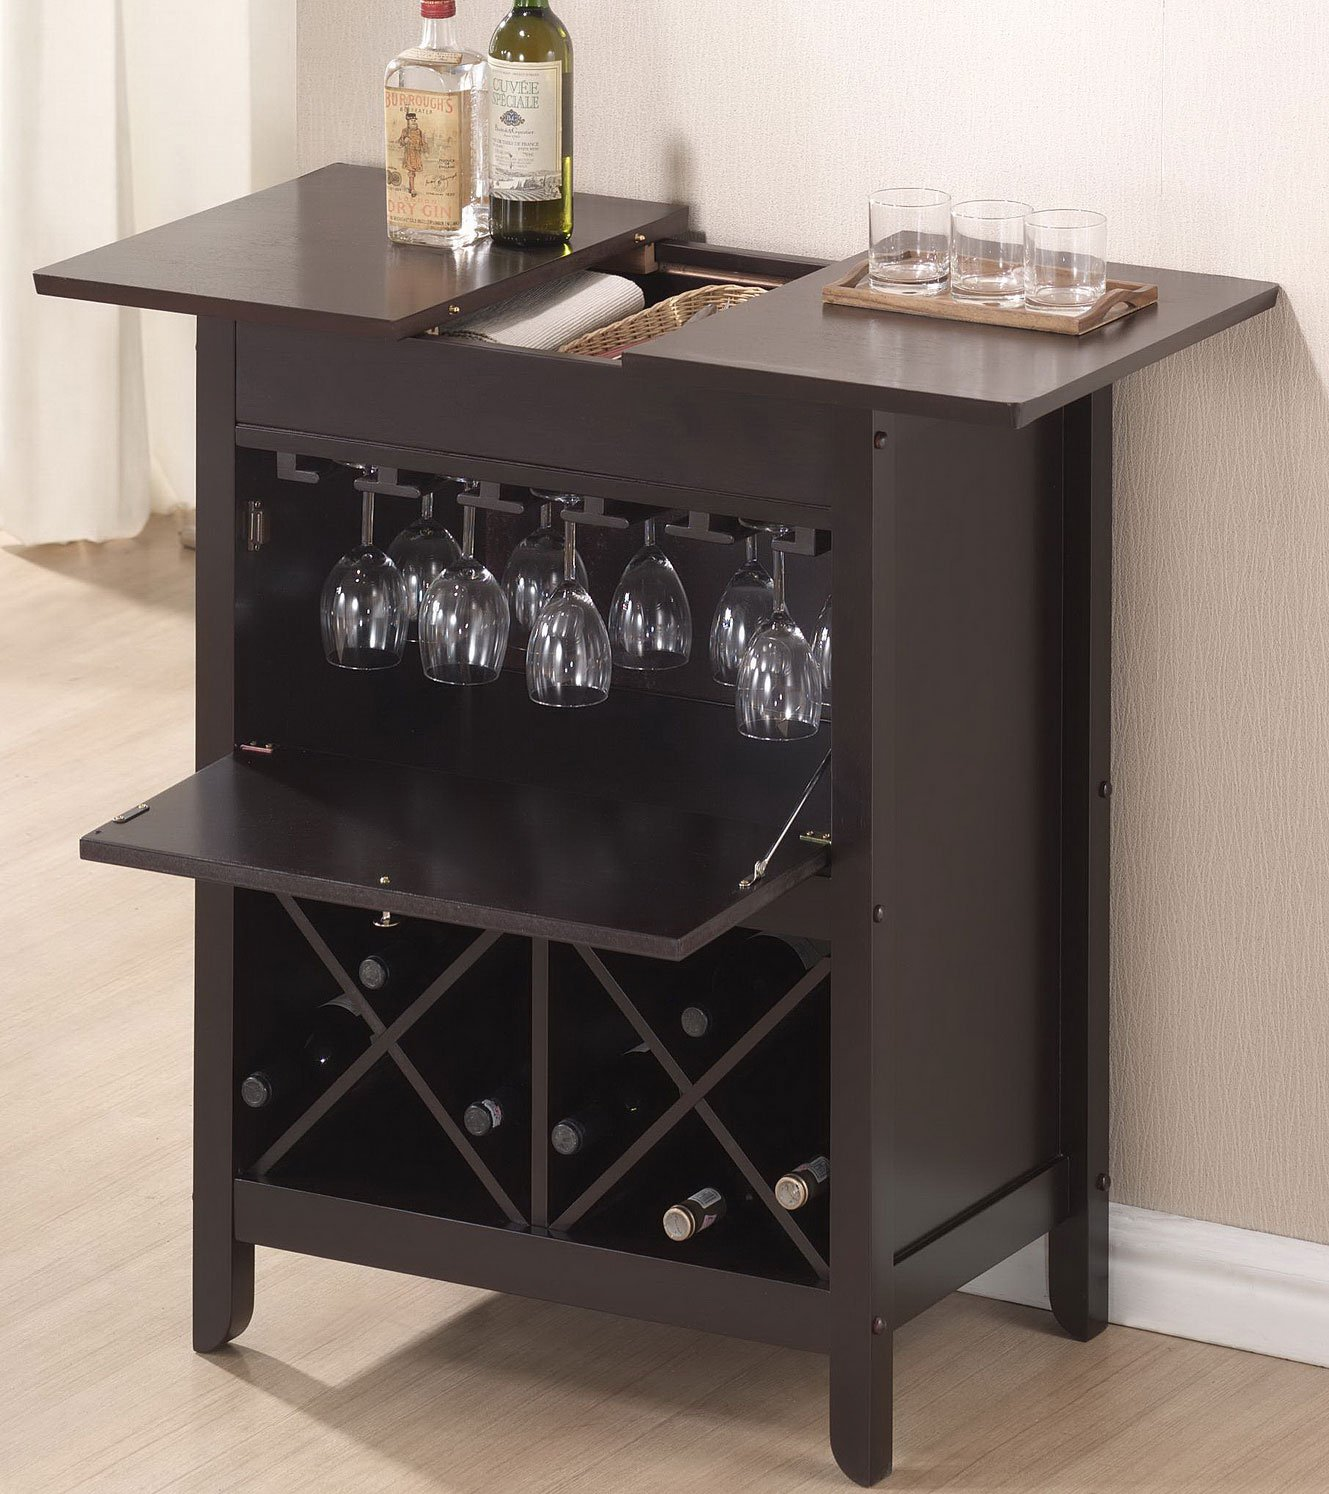 Buy Baxton Studio Tuscany Modern Dry Bar and Wine Cabinet ...